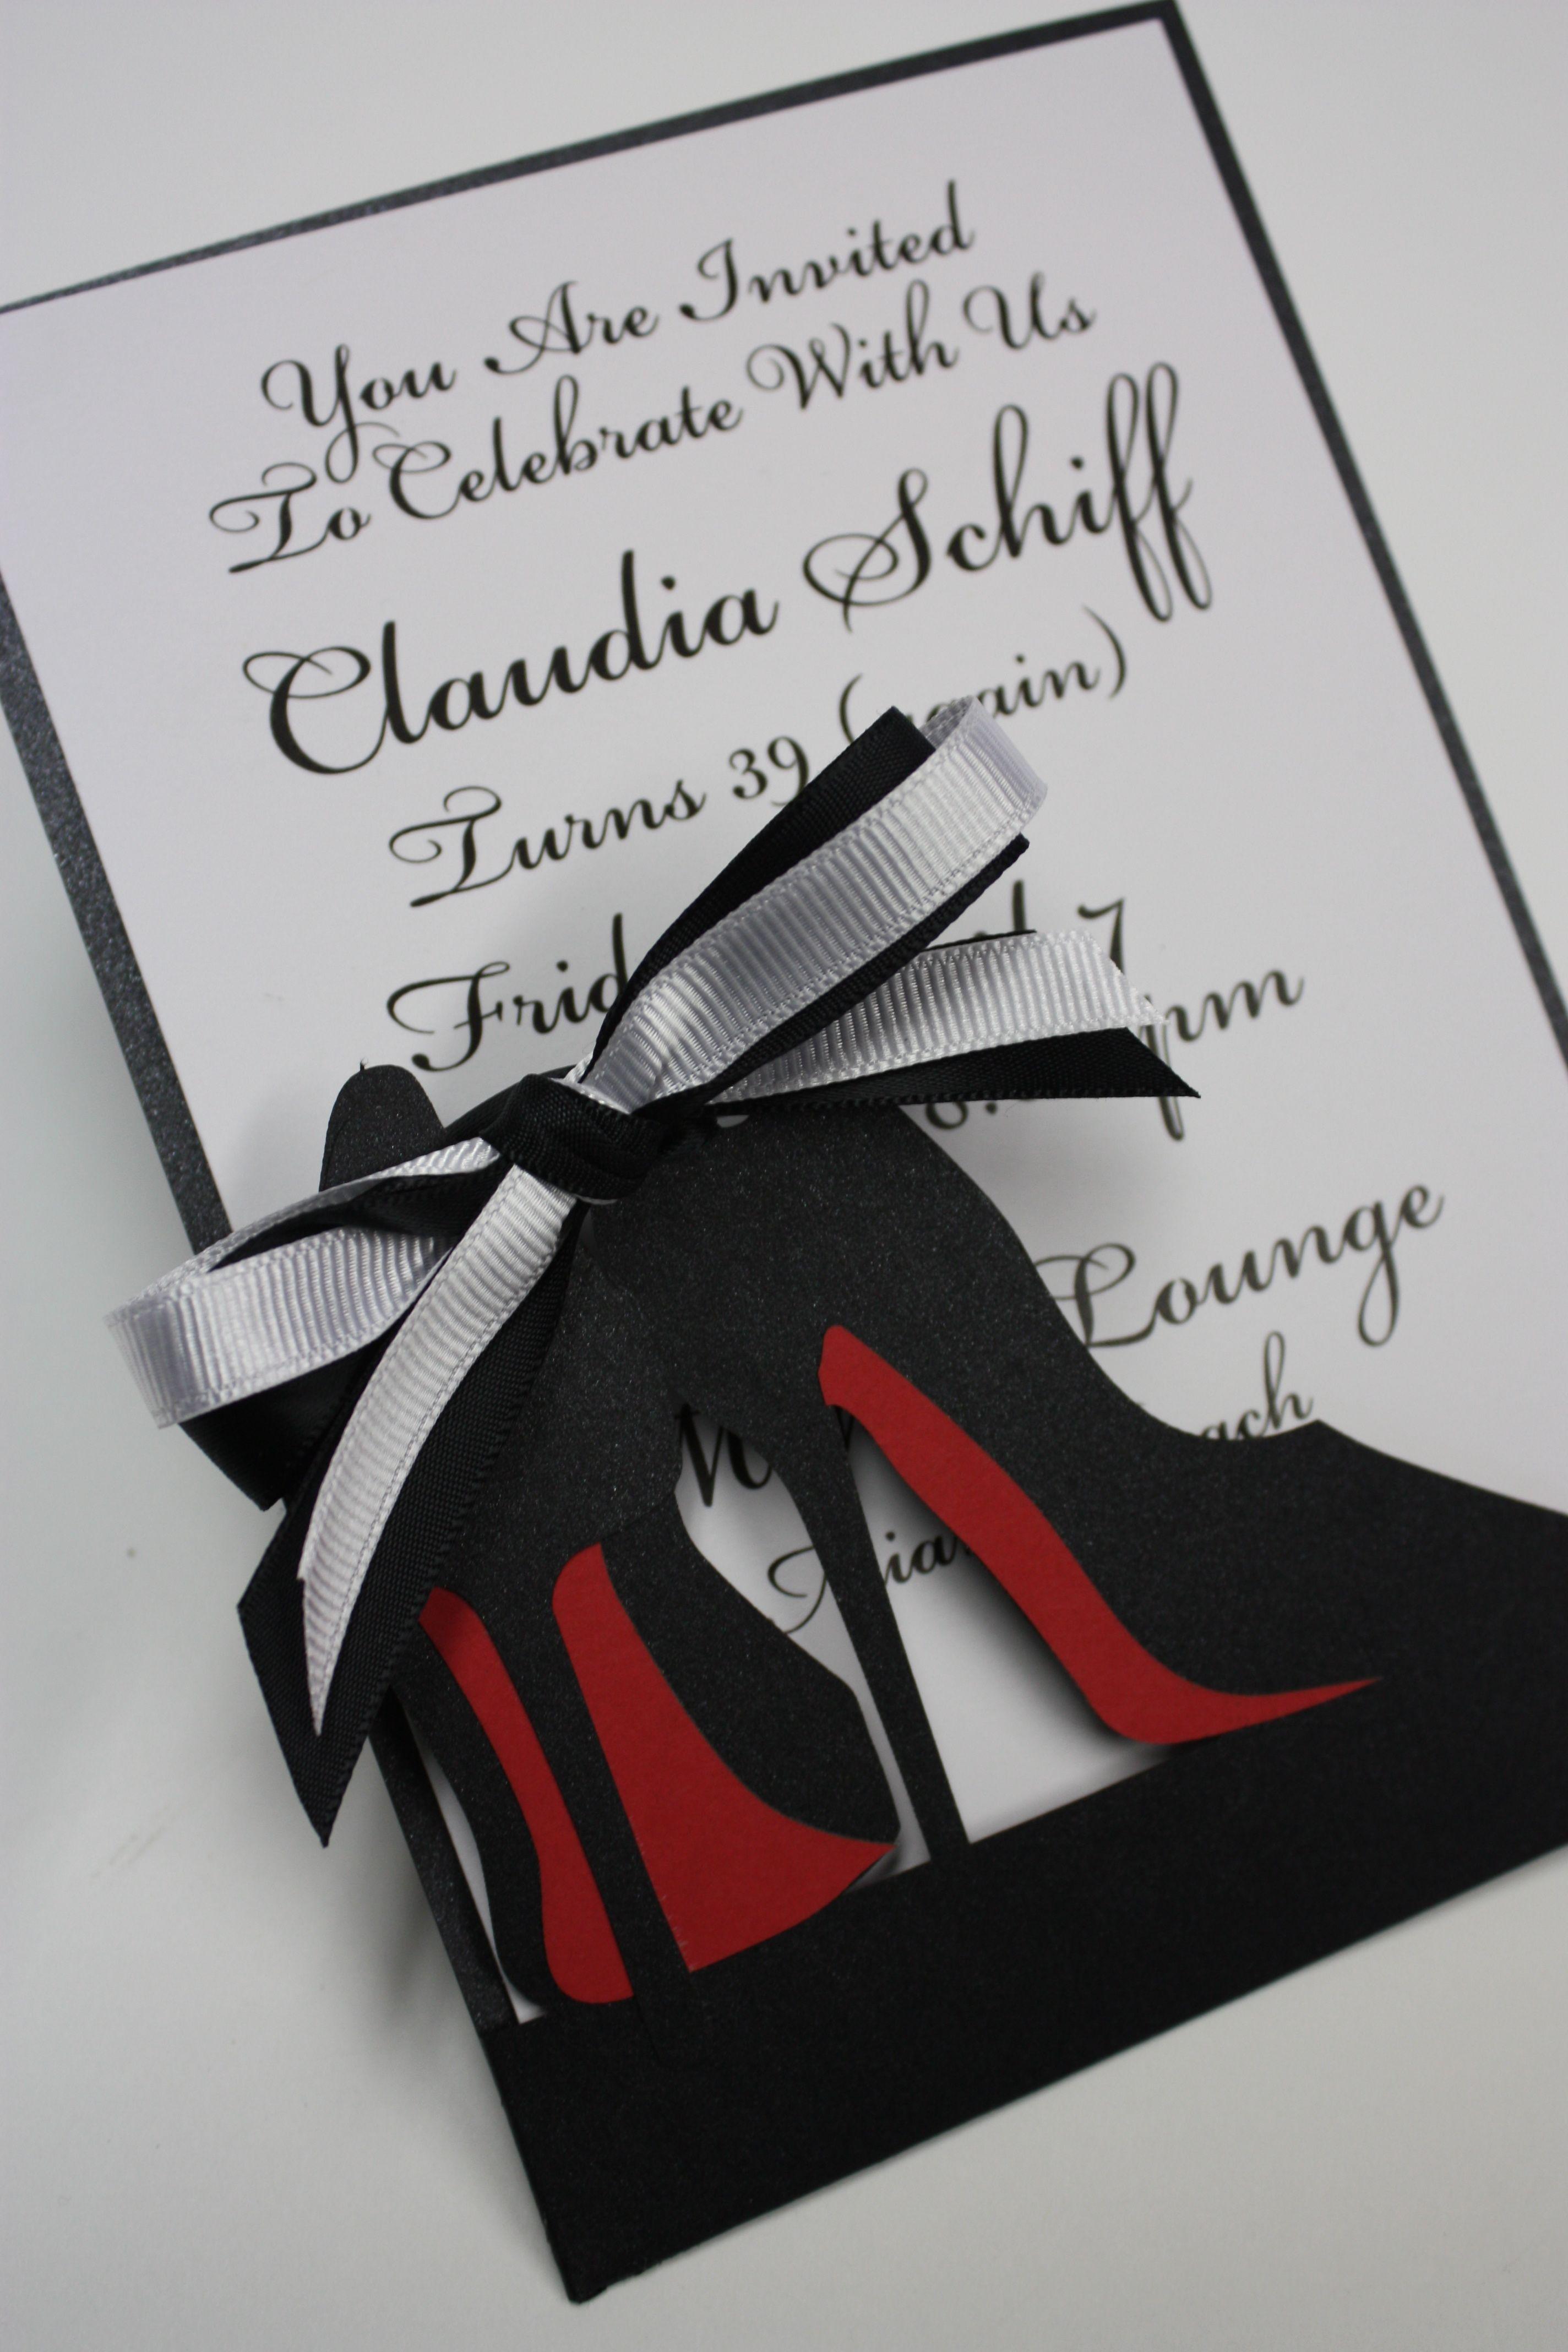 db193fd1586a9d8a97b913b0d6a2a060 high heel fashionista laser cut invitation www katblustudio etsy,Laser Cut Party Invitations